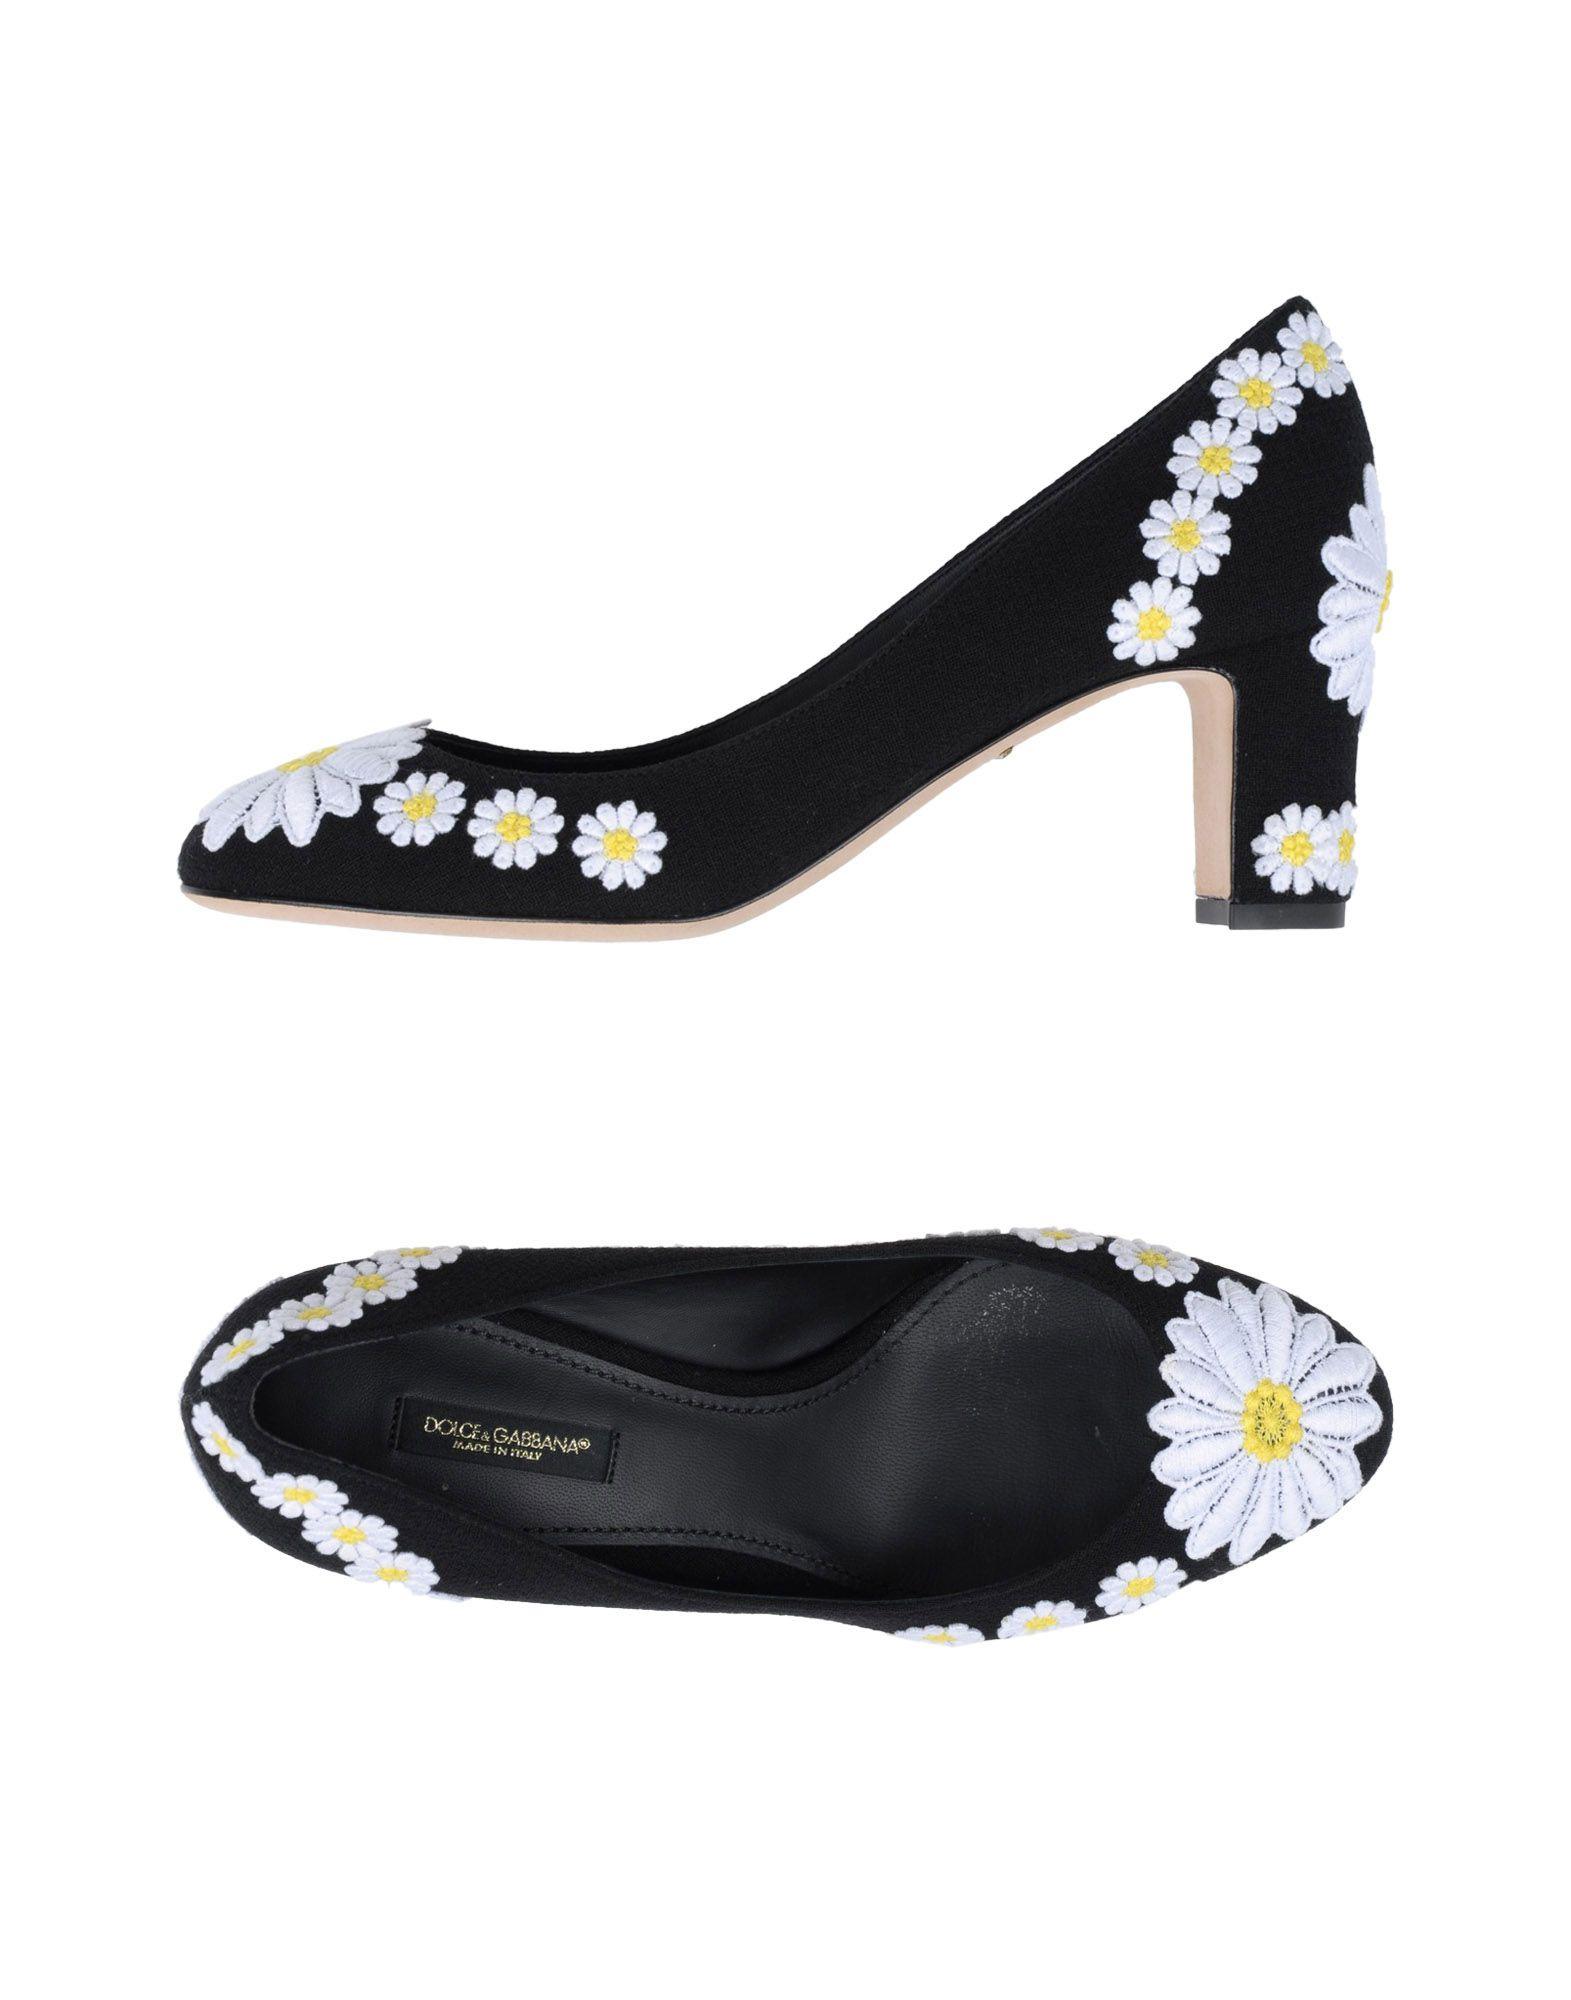 Casual salvaje Zapato De Salón Dolce & Dolce Gabbana Mujer - Salones Dolce & & Gabbana  Negro df7556